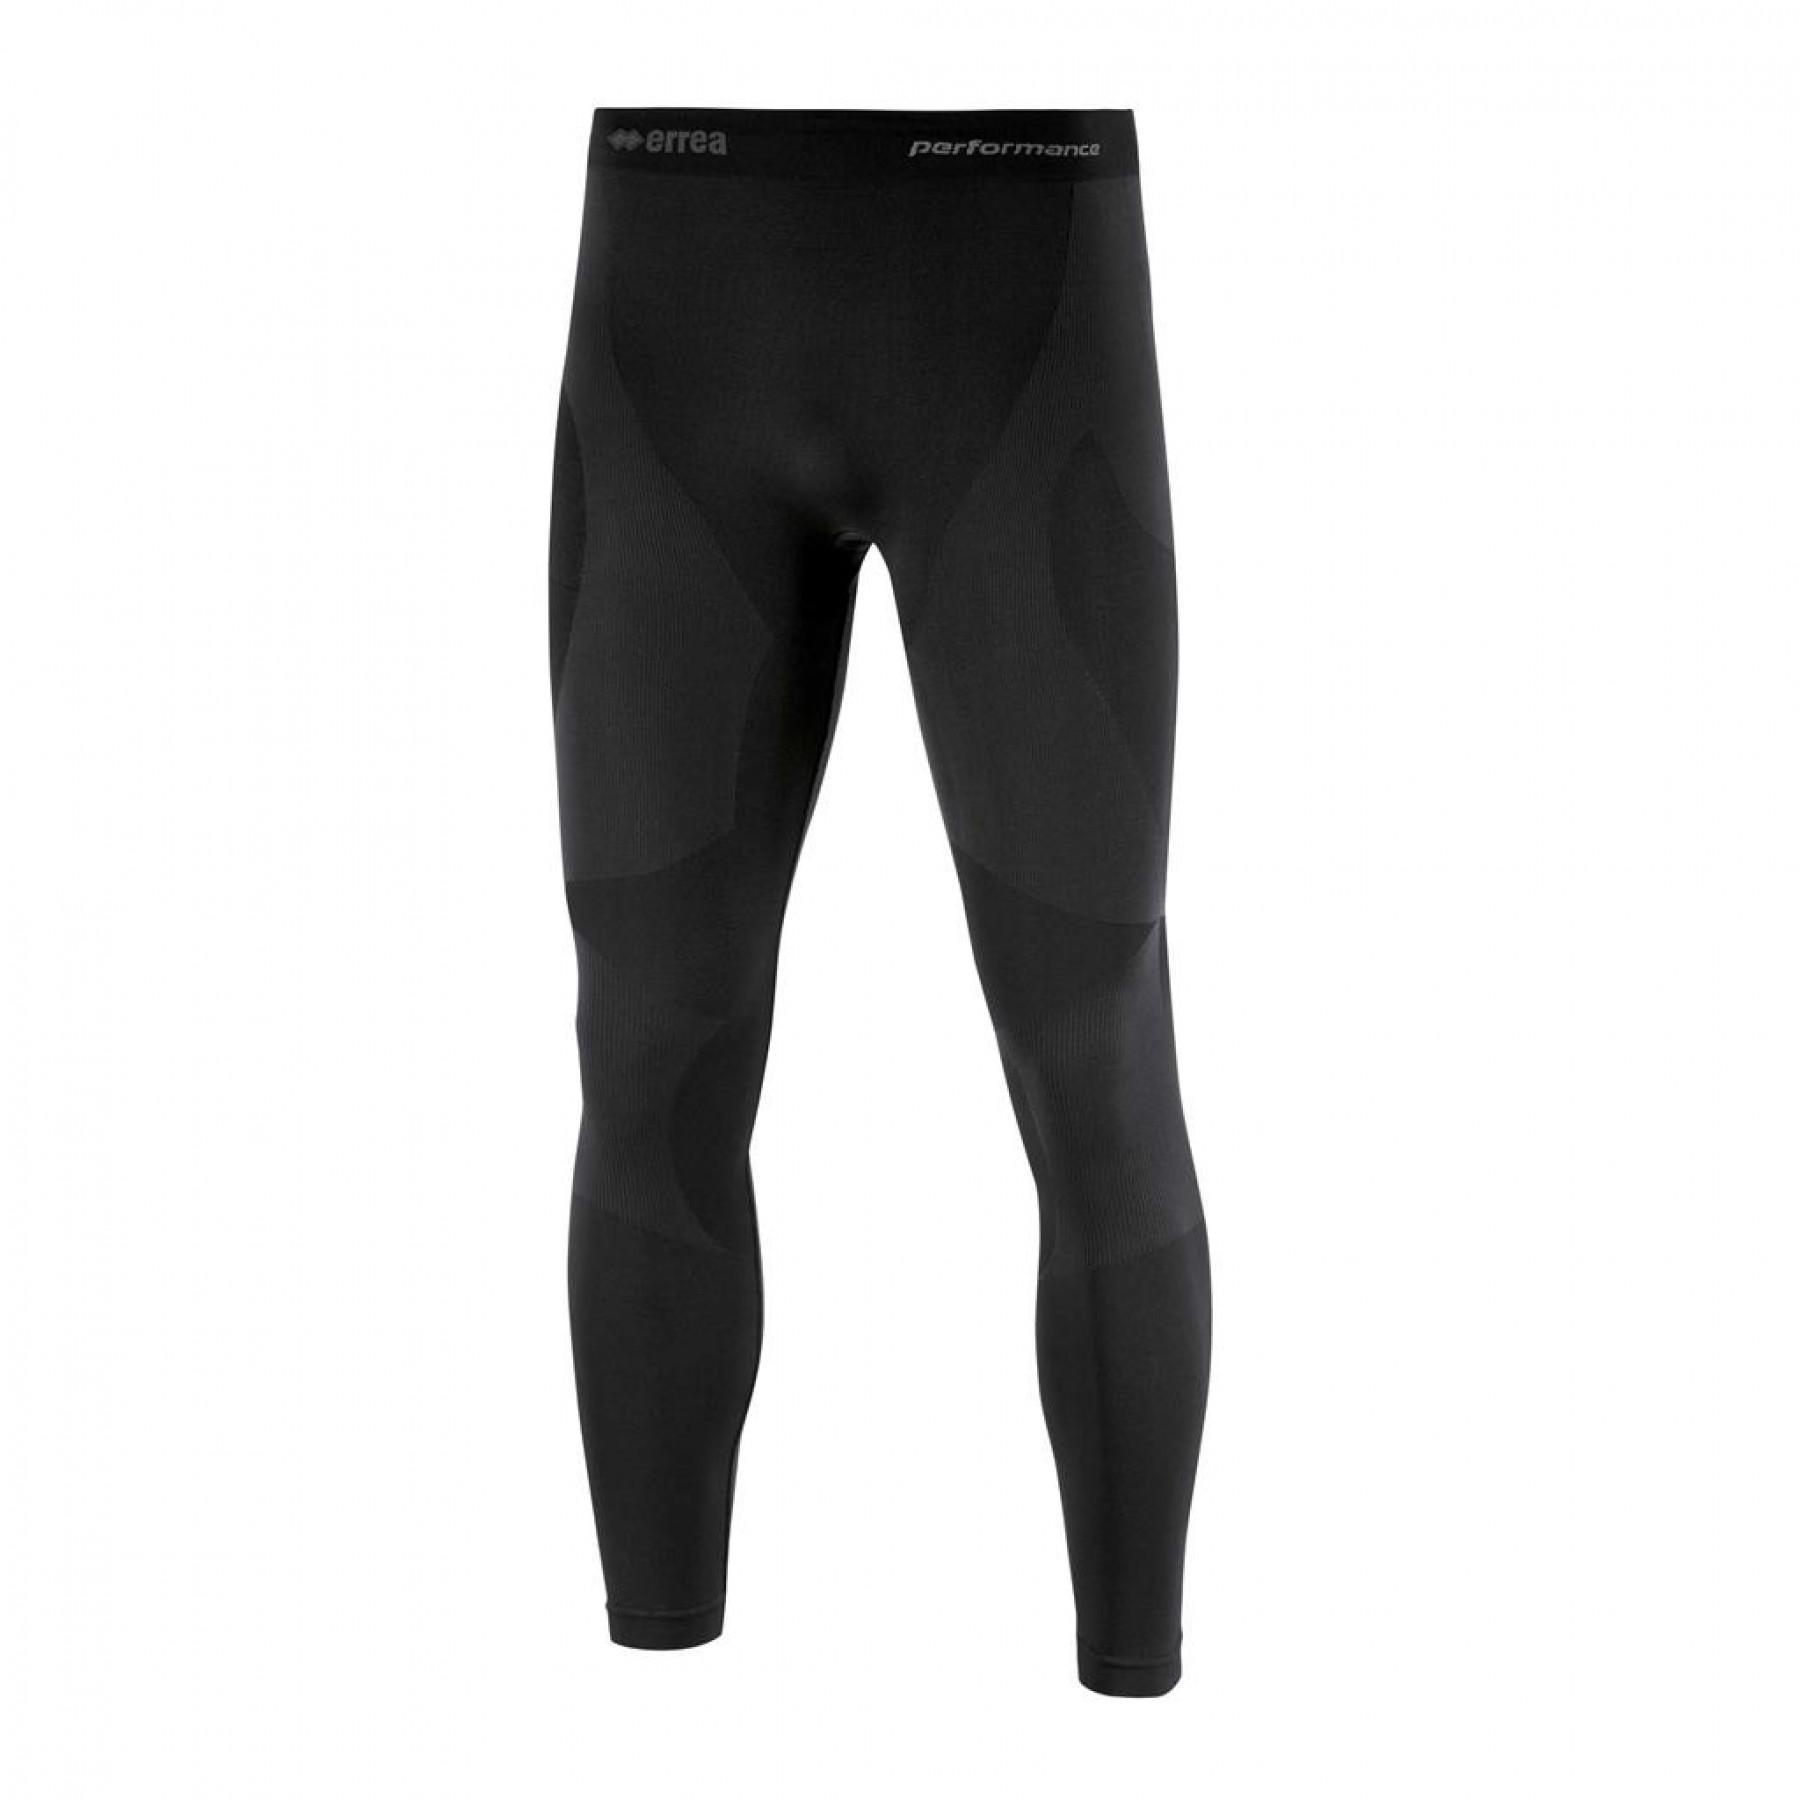 Compression Pants Errea Damian